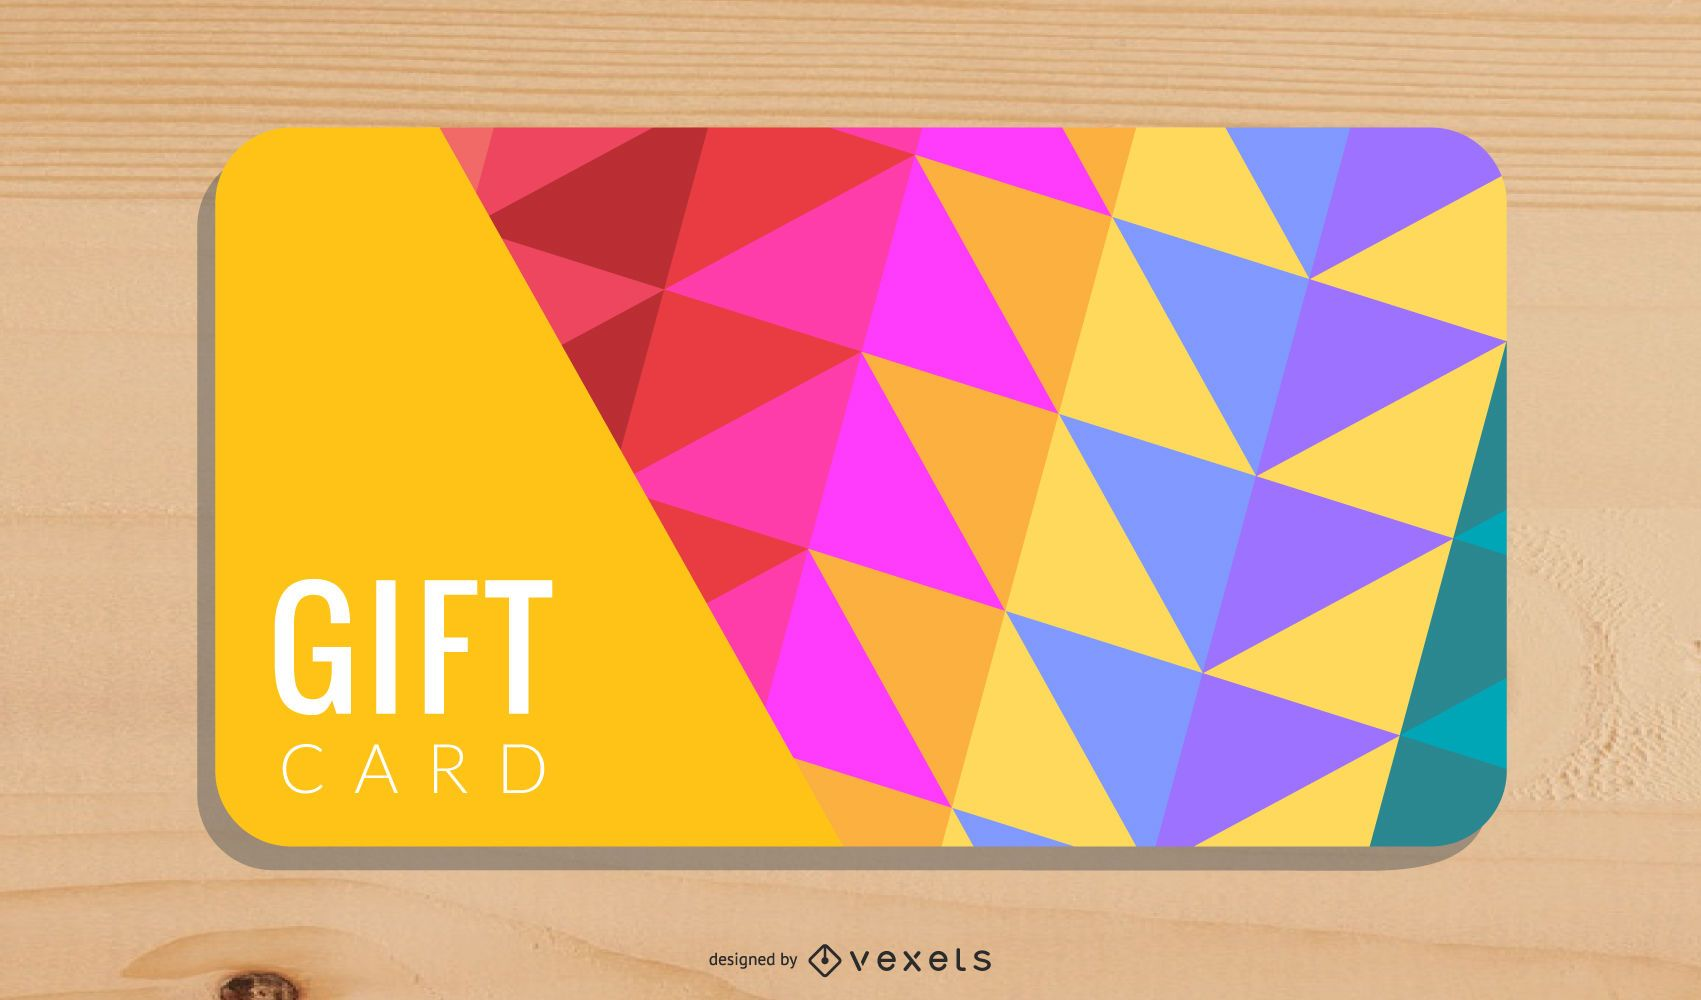 Gift Card Background Design